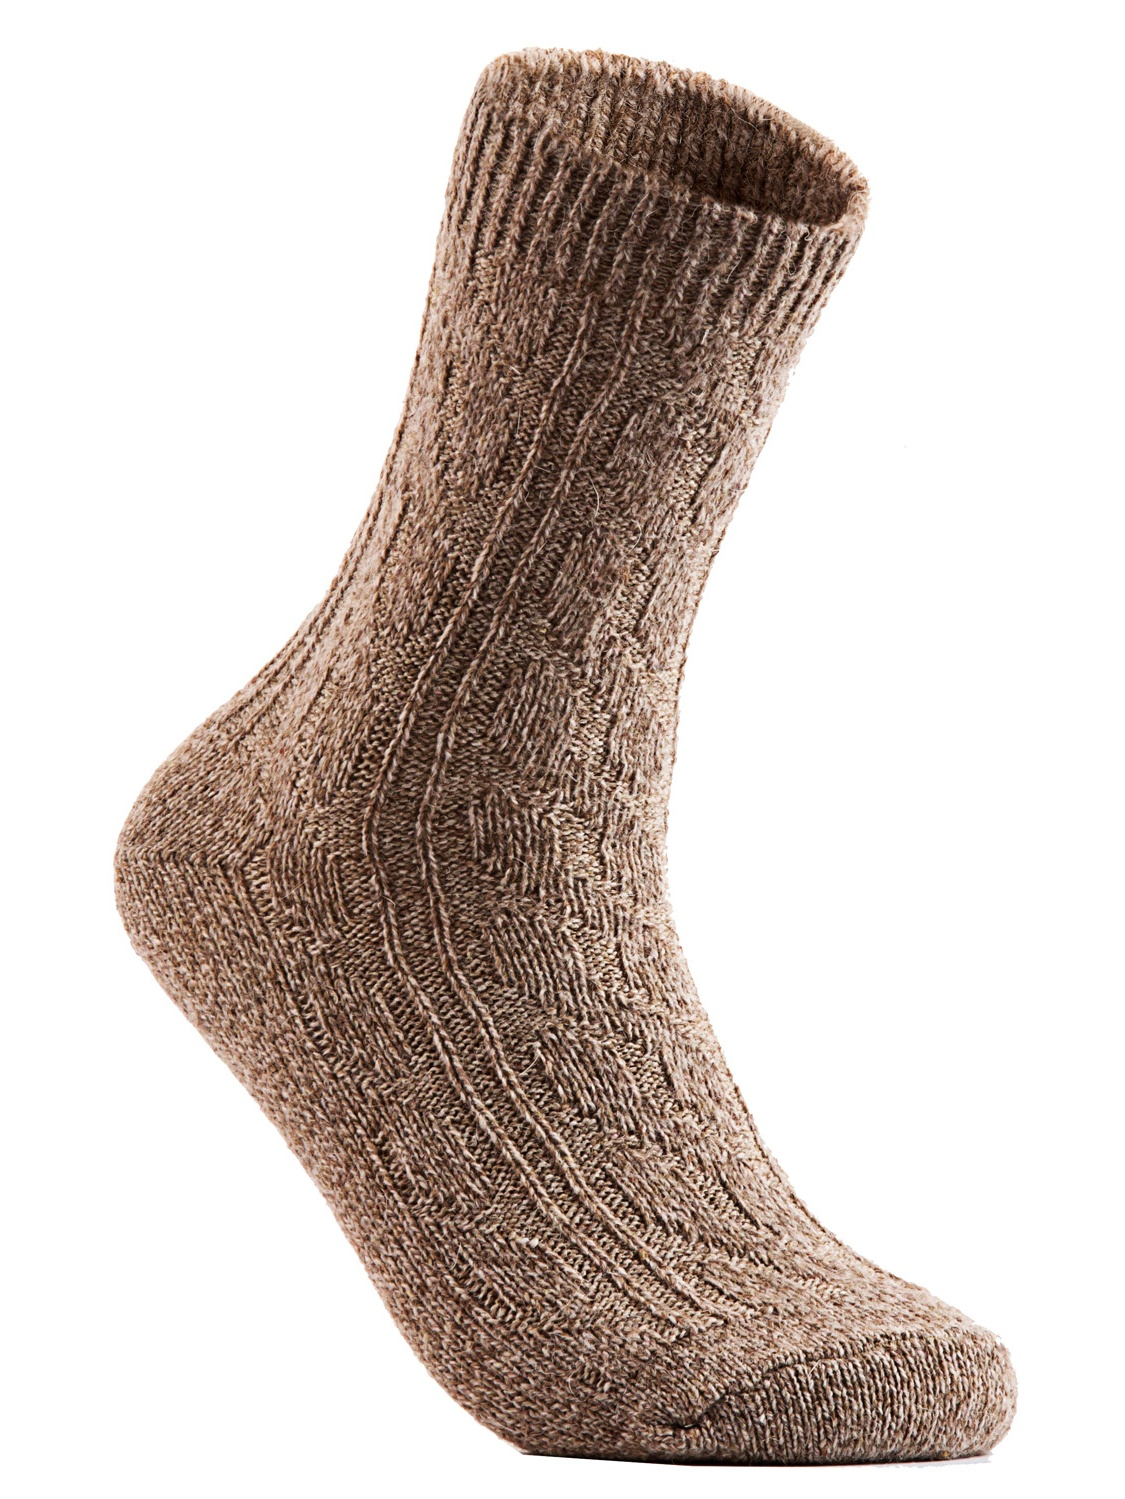 Big Girl's Women's 6 Pairs Pack Fashion Soft Wool Crew Socks One Size AHR1613(Tan)